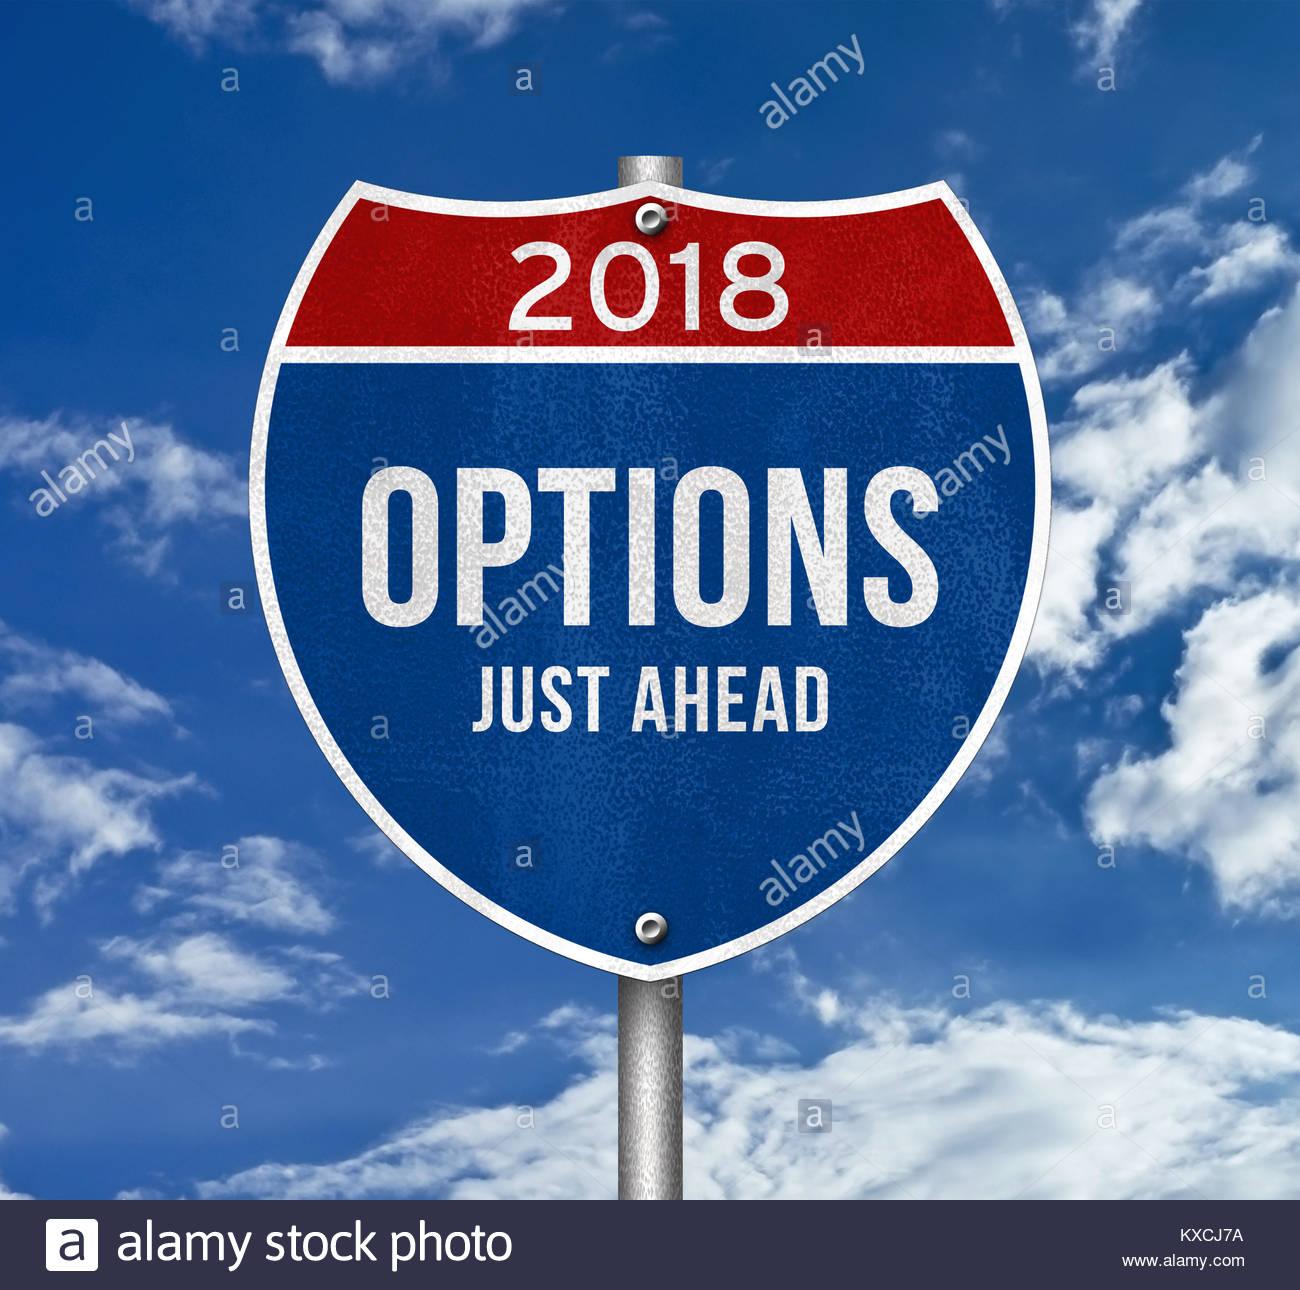 Options - juste avant Photo Stock